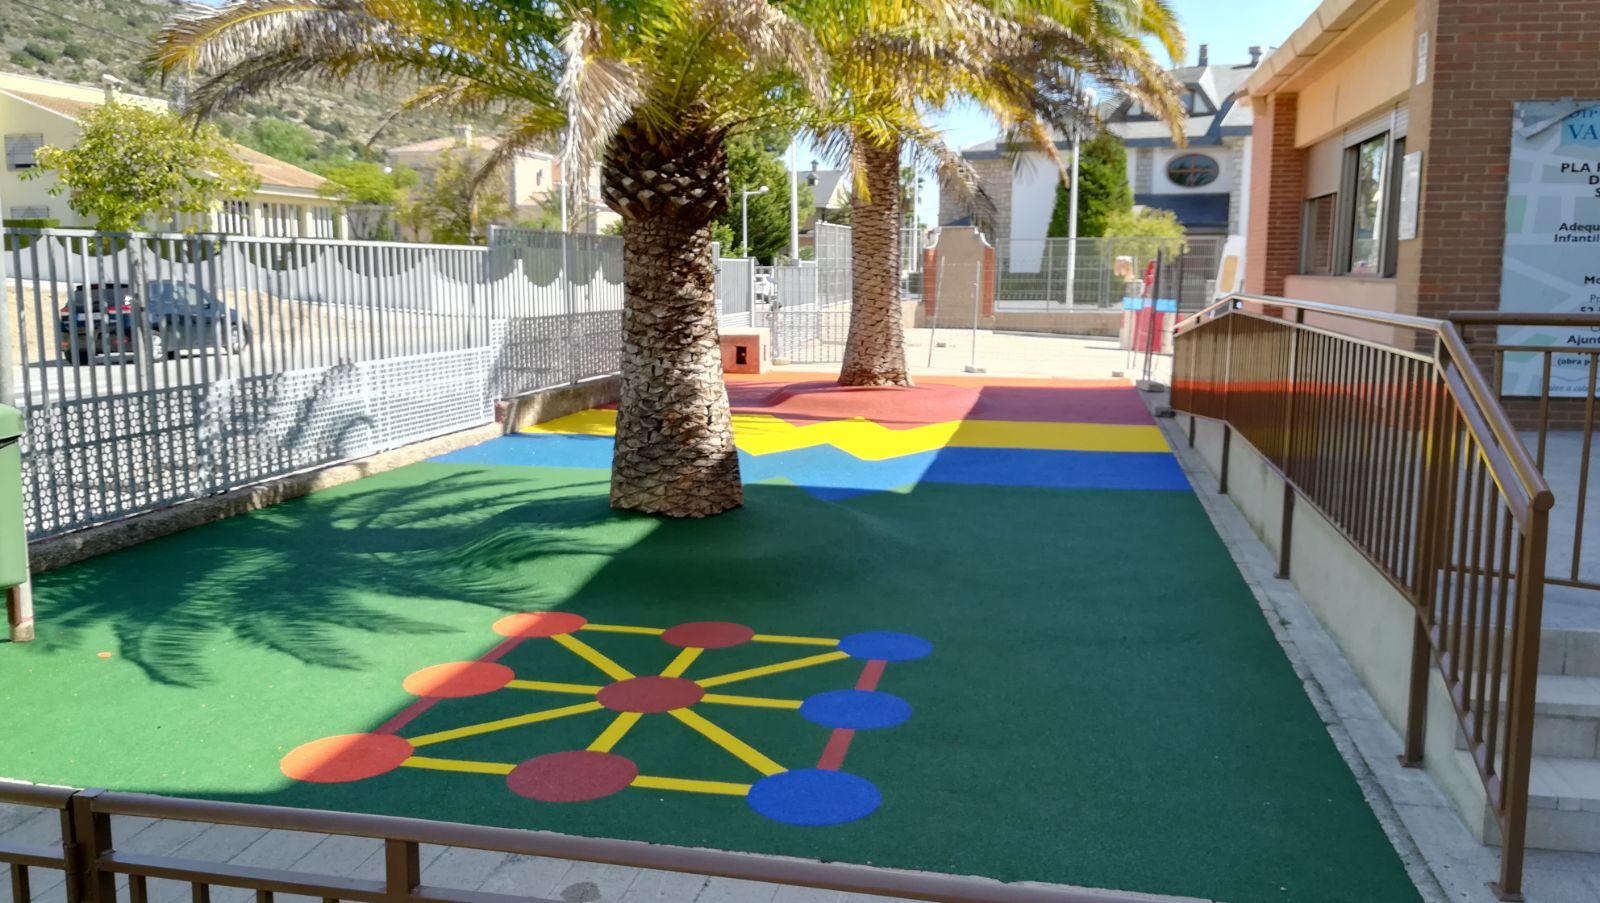 Parques infantiles troe parques y mobiliario - Suelos vinilicos infantiles ...